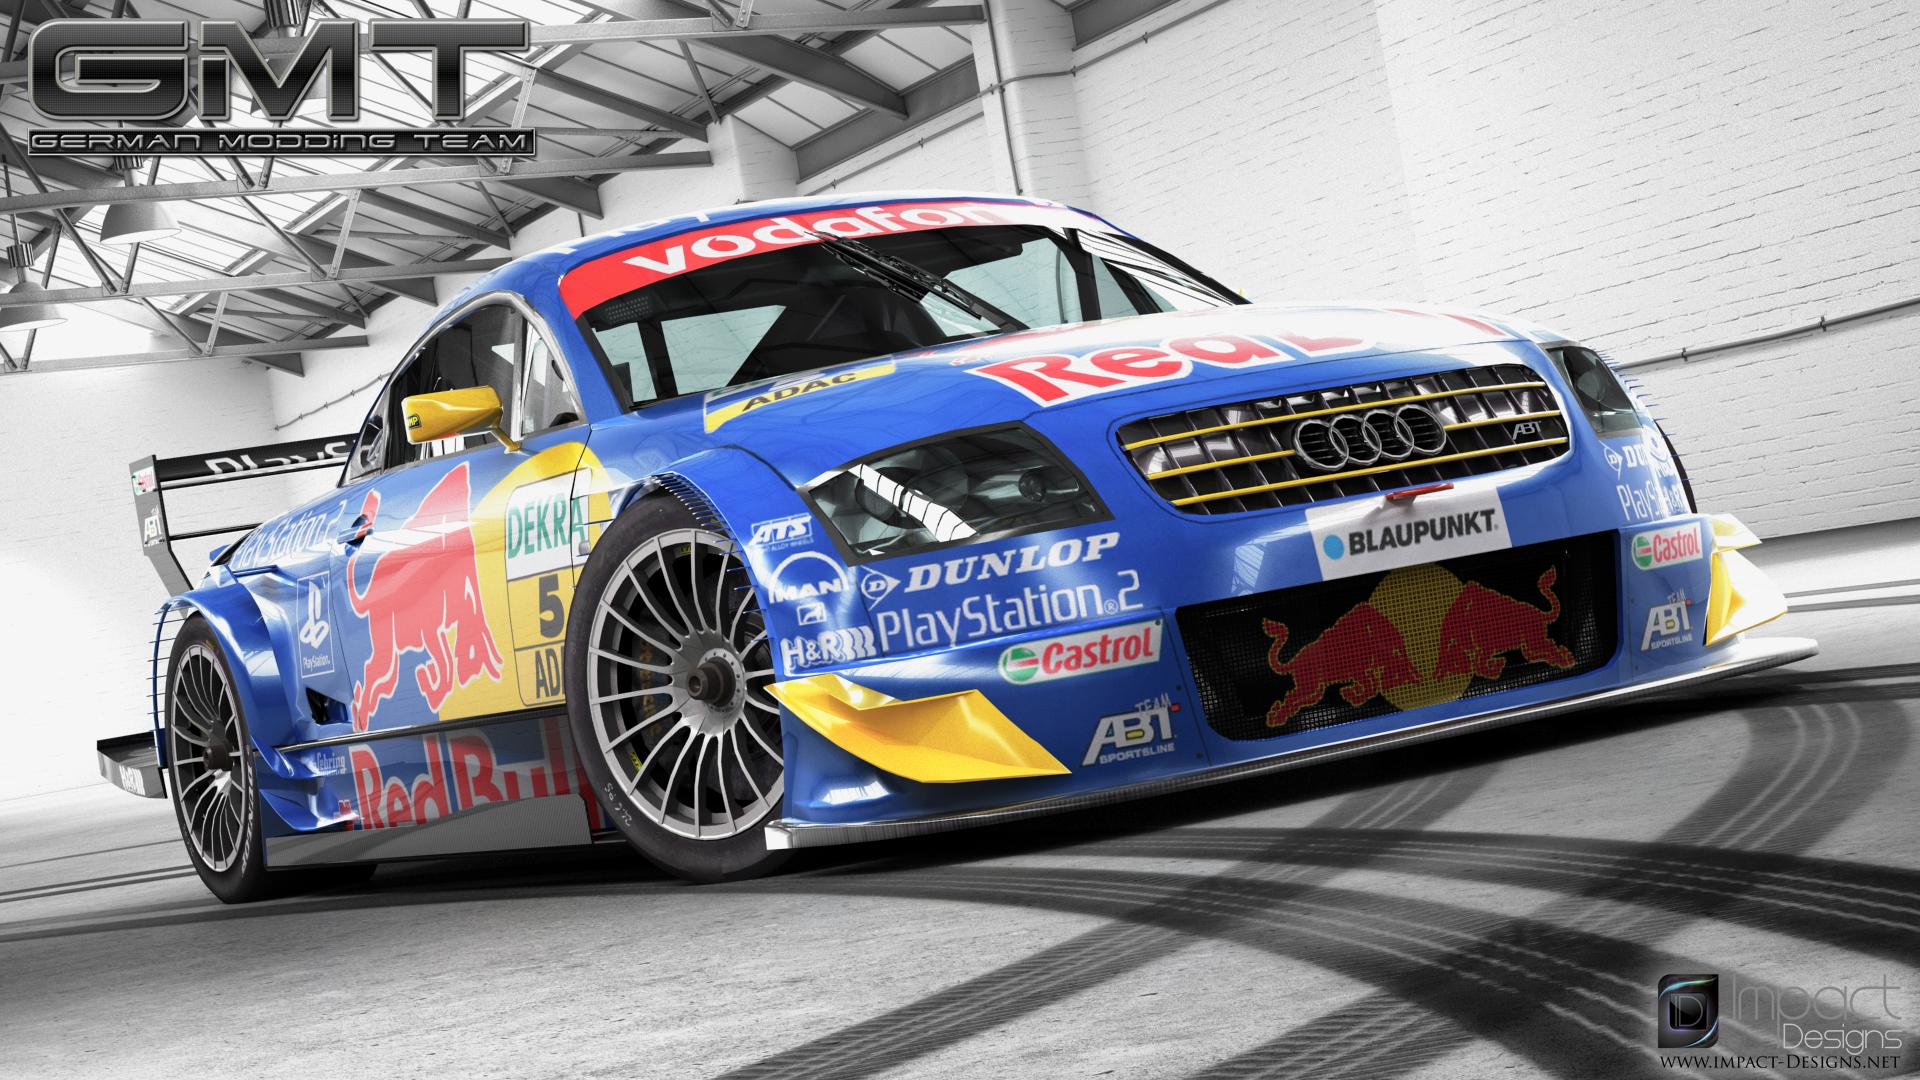 Audi tt r dtm 2003 new renders virtualr sim racing news